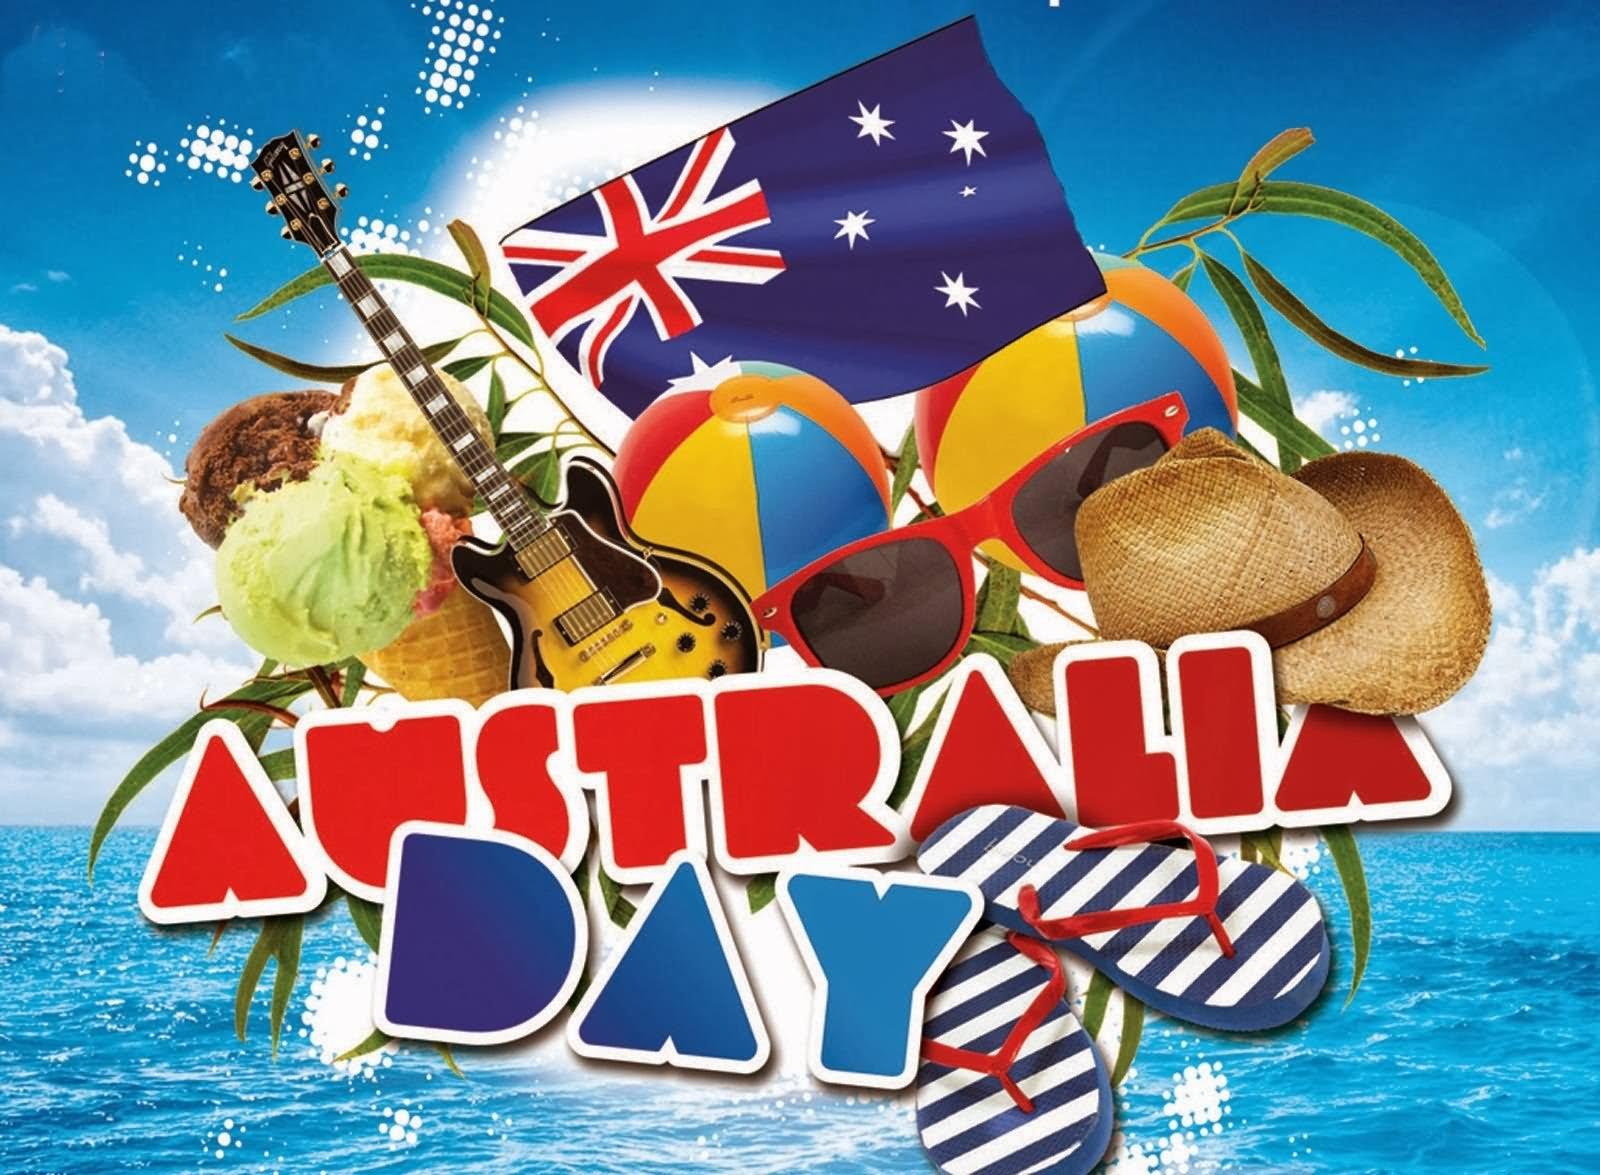 happy australia day wishes picture